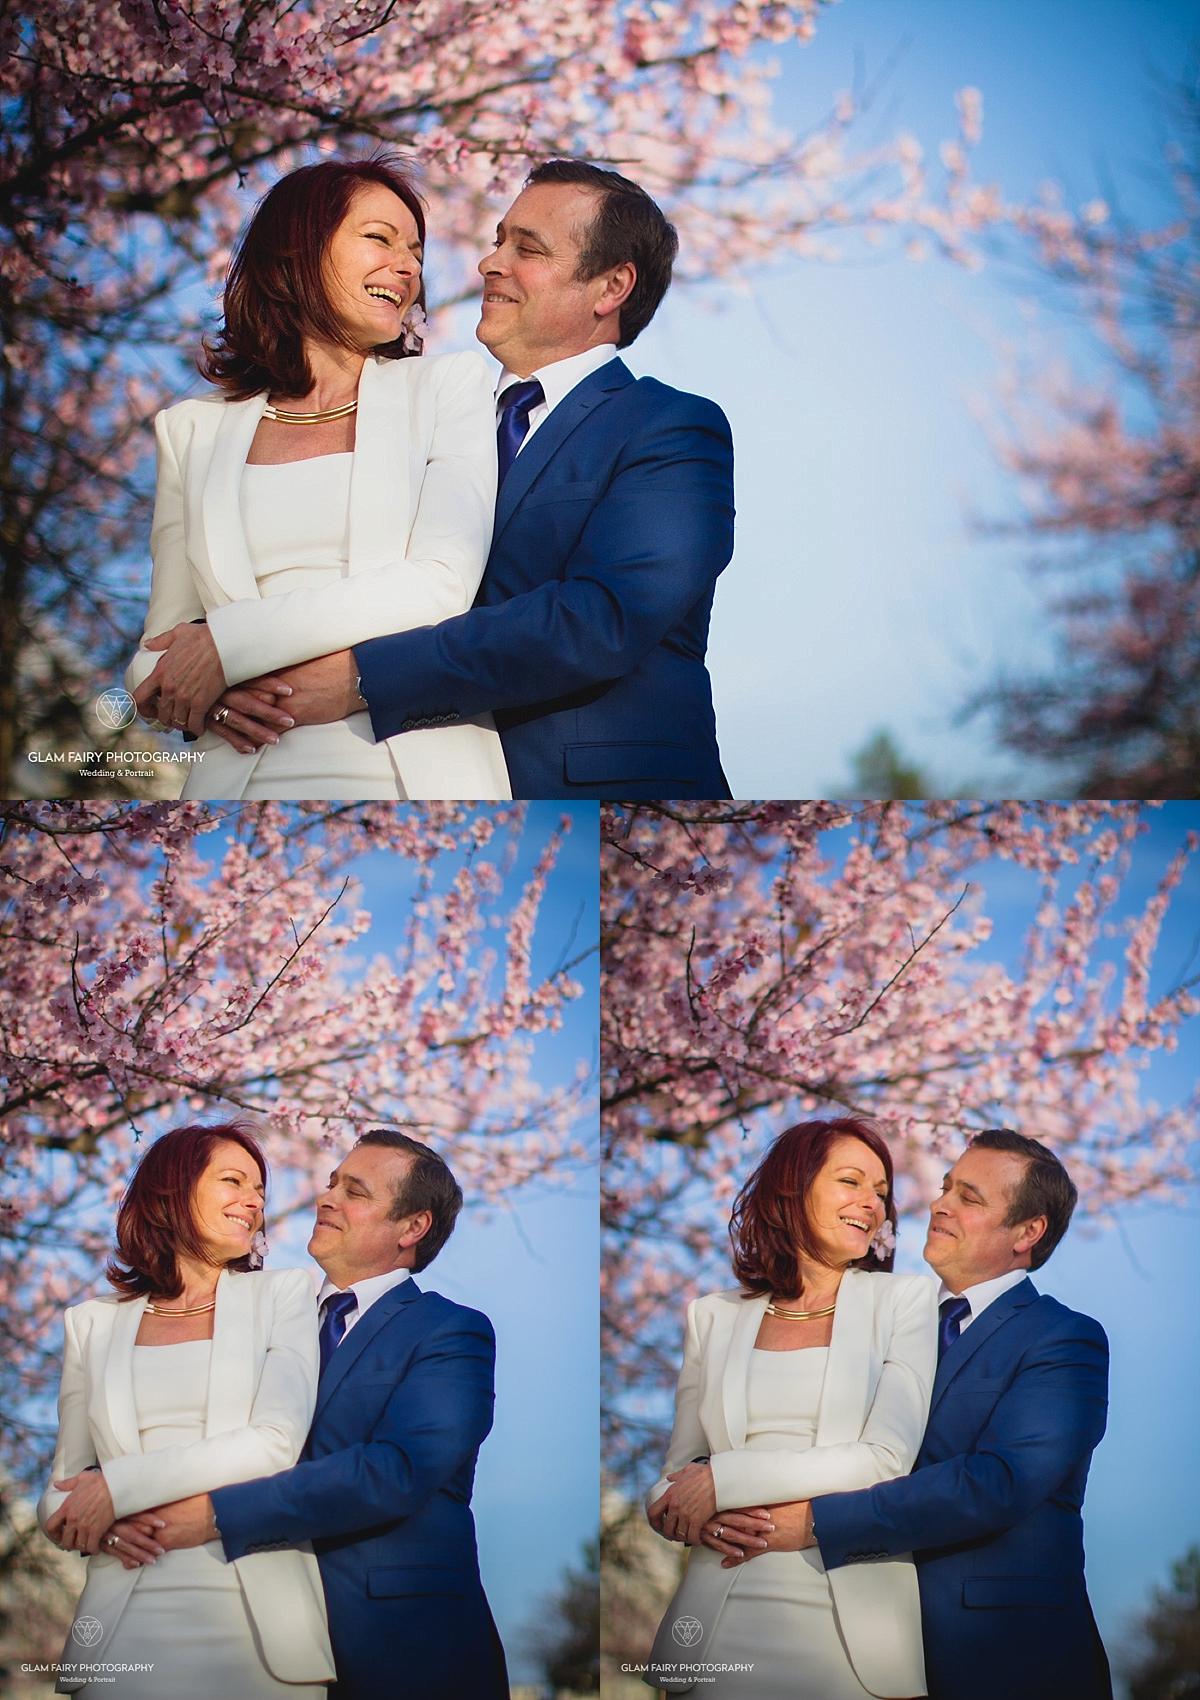 GlamFairyPhotography-mariage-civil-vincennes-patricia_0025